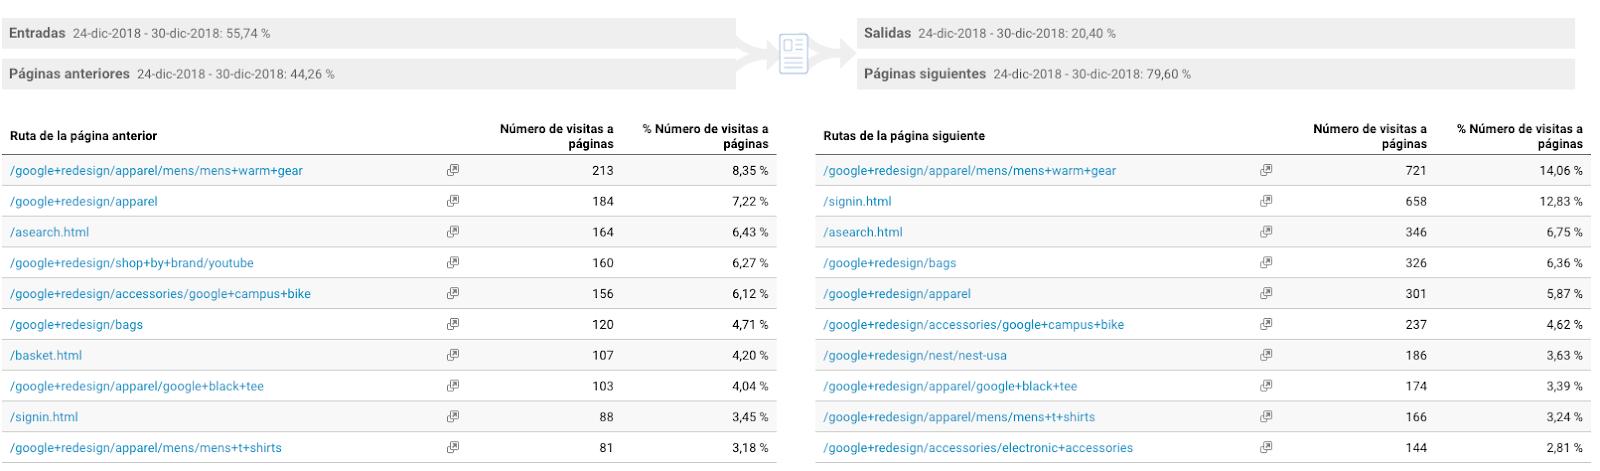 Google-analytics-informe-resumen-navegacion-trafico-web